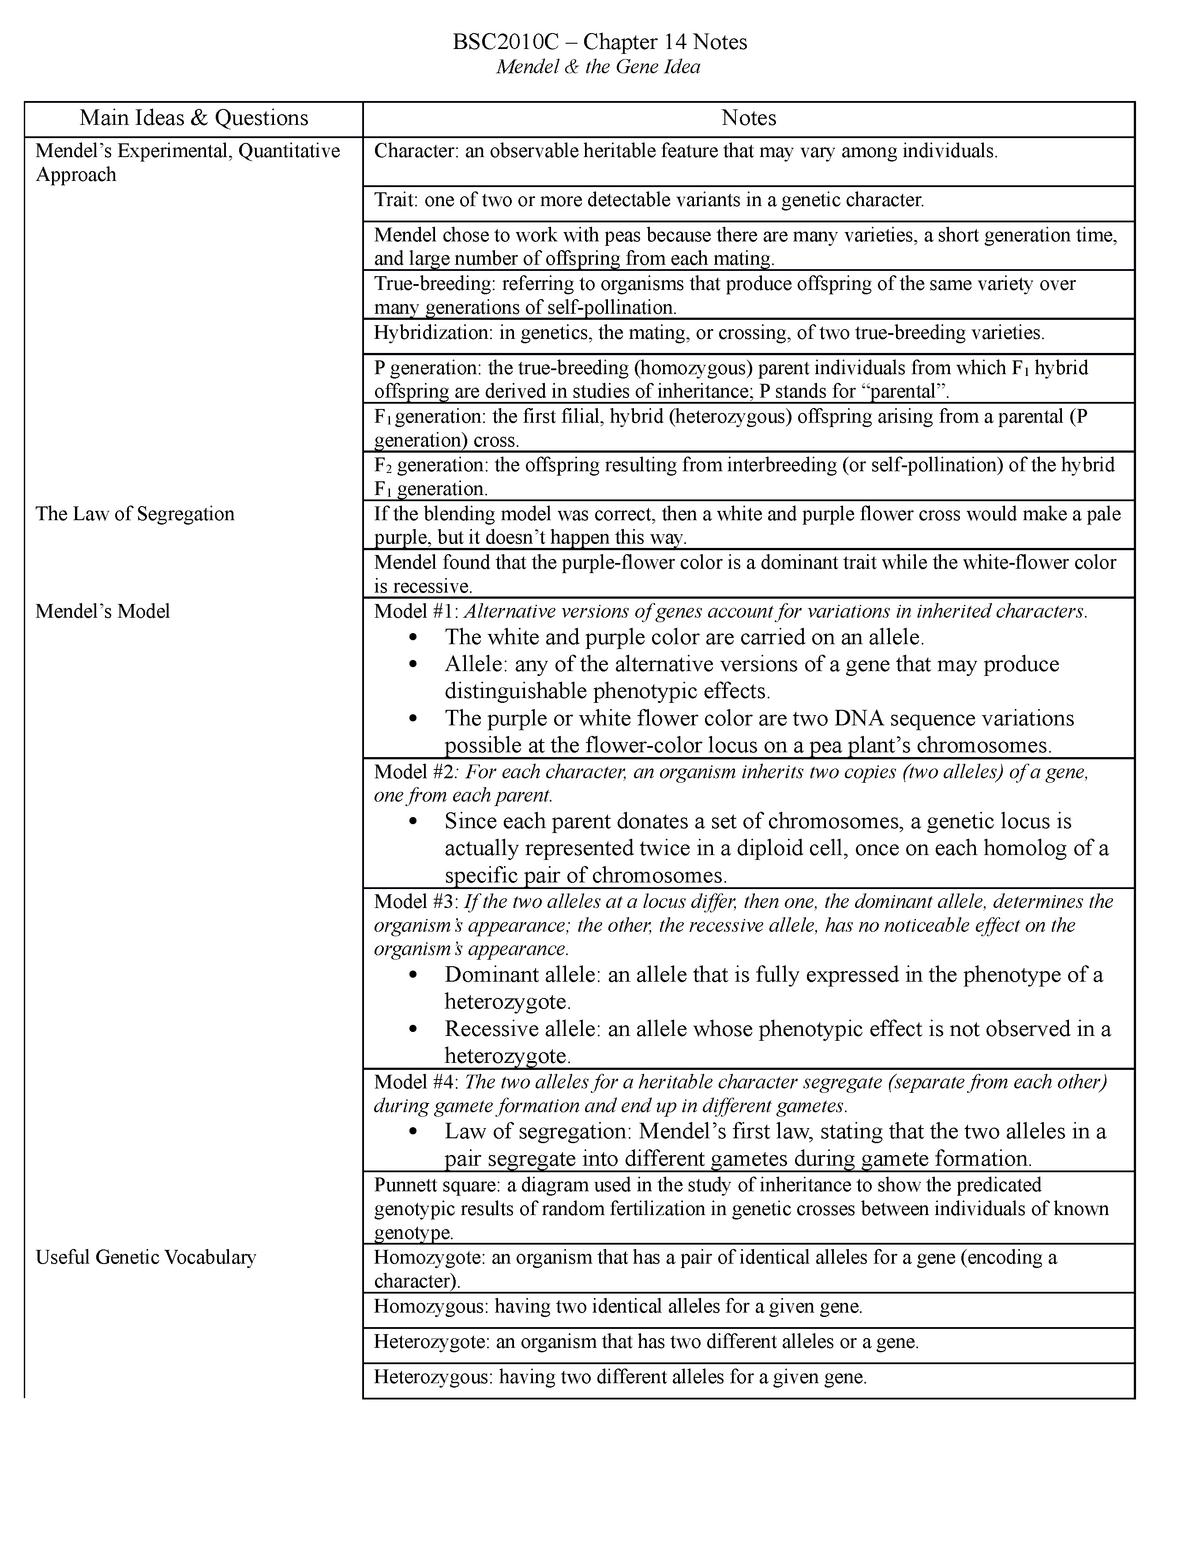 BSC2010 C - Chapter 14 Notes - BSC 2010C : Biology I - StuDocu